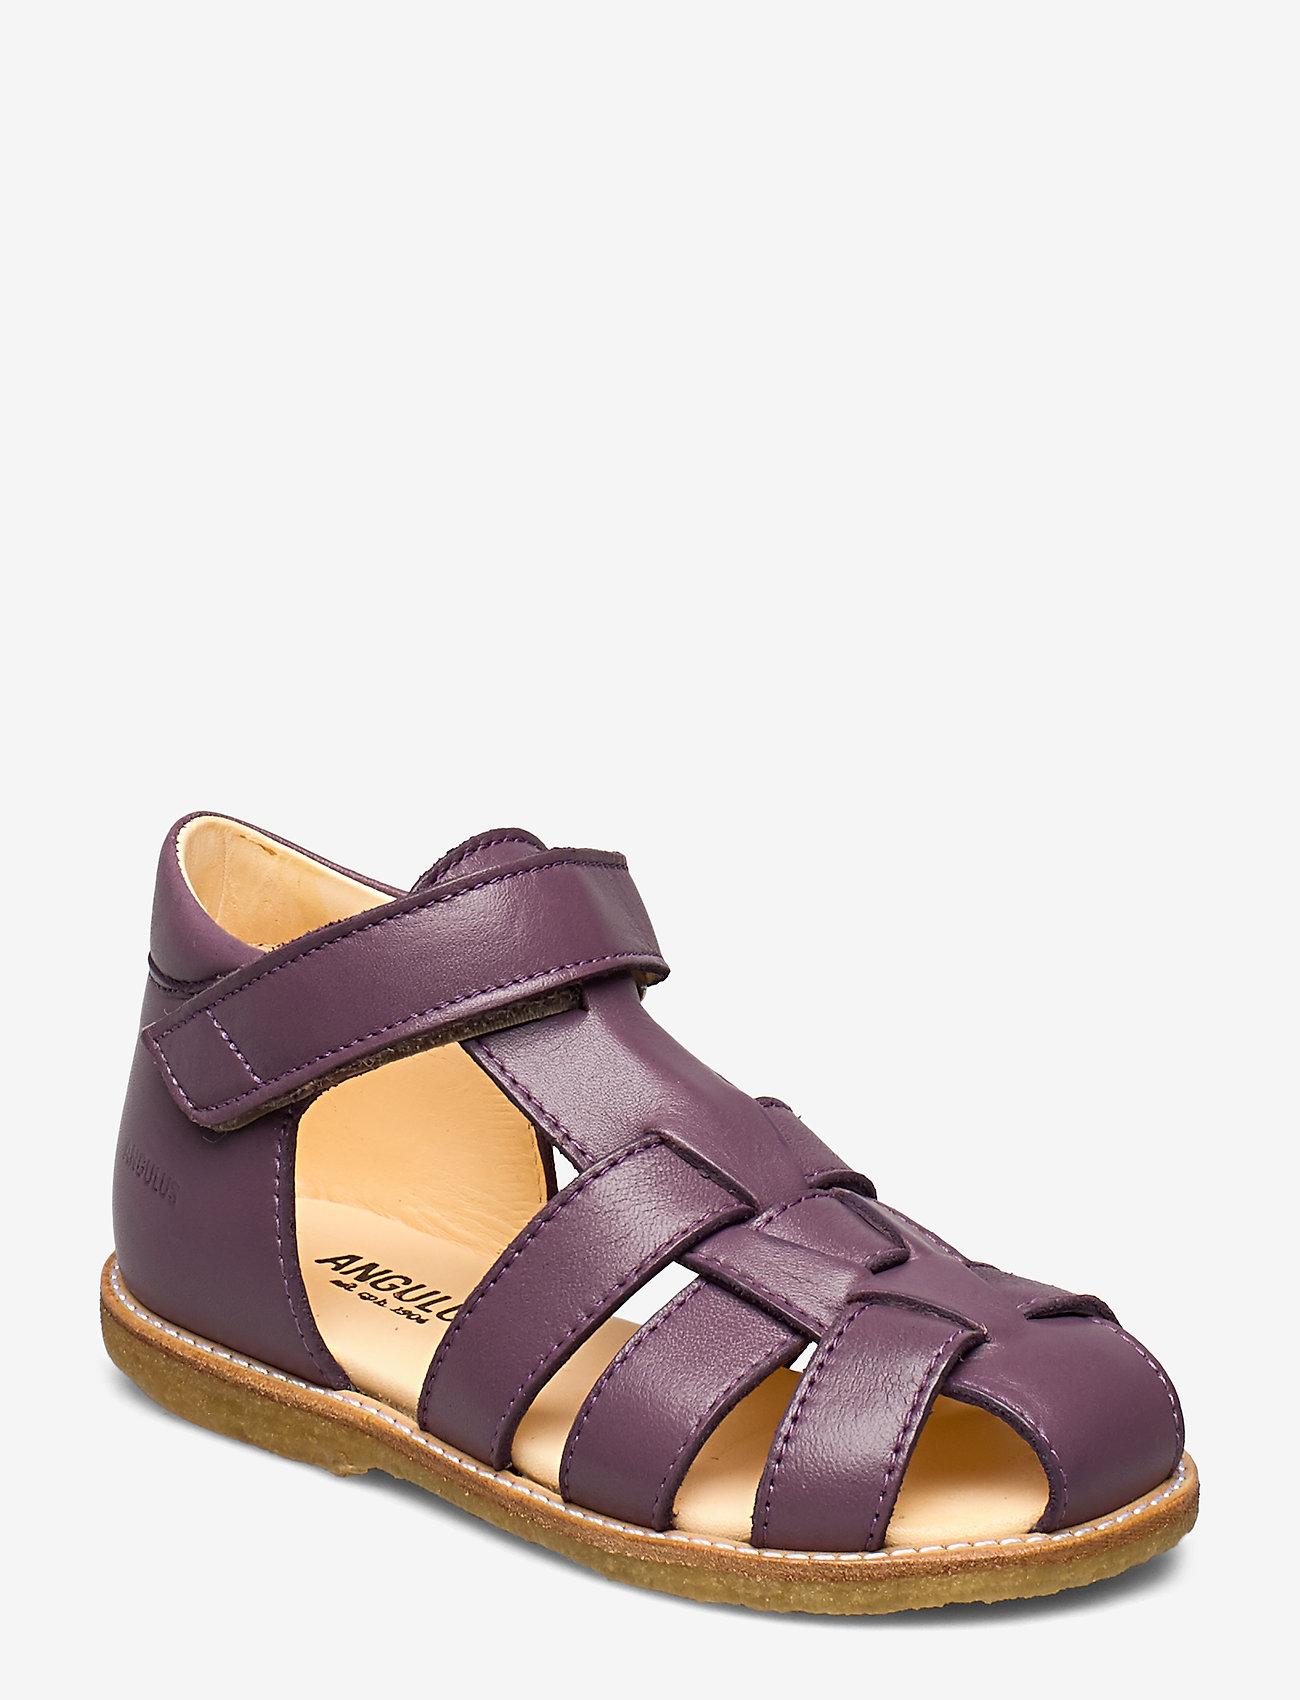 ANGULUS - Baby sandal - sandals - 1568 lavender - 0